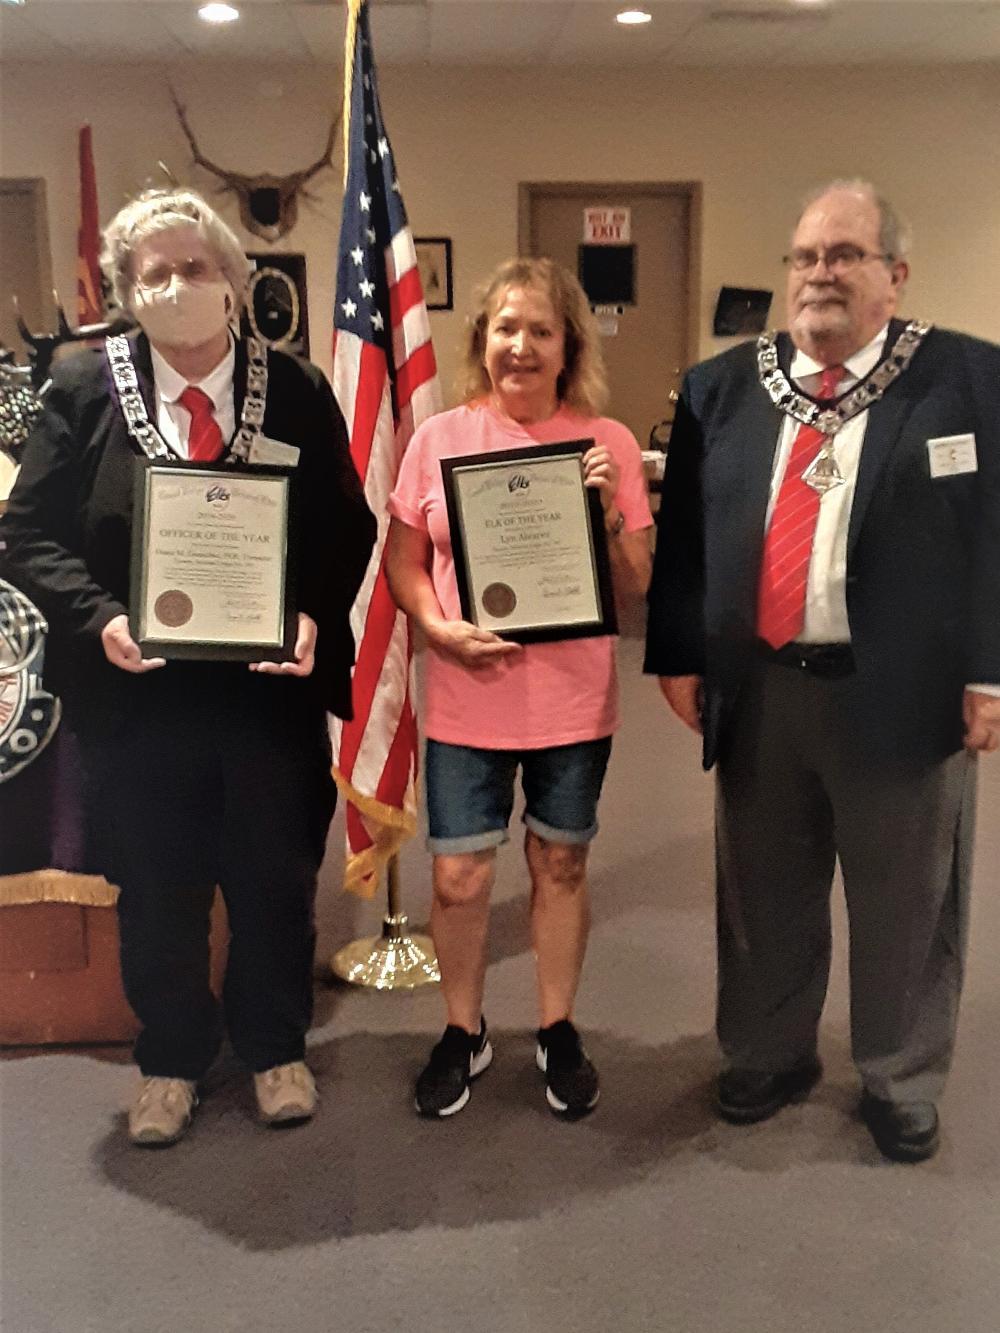 L-R: 2019-2020 Lodge Officer of the Year, Treasurer D. Gnuschke, Elk of the Tear, L. Alvarez, PER, J. Riley